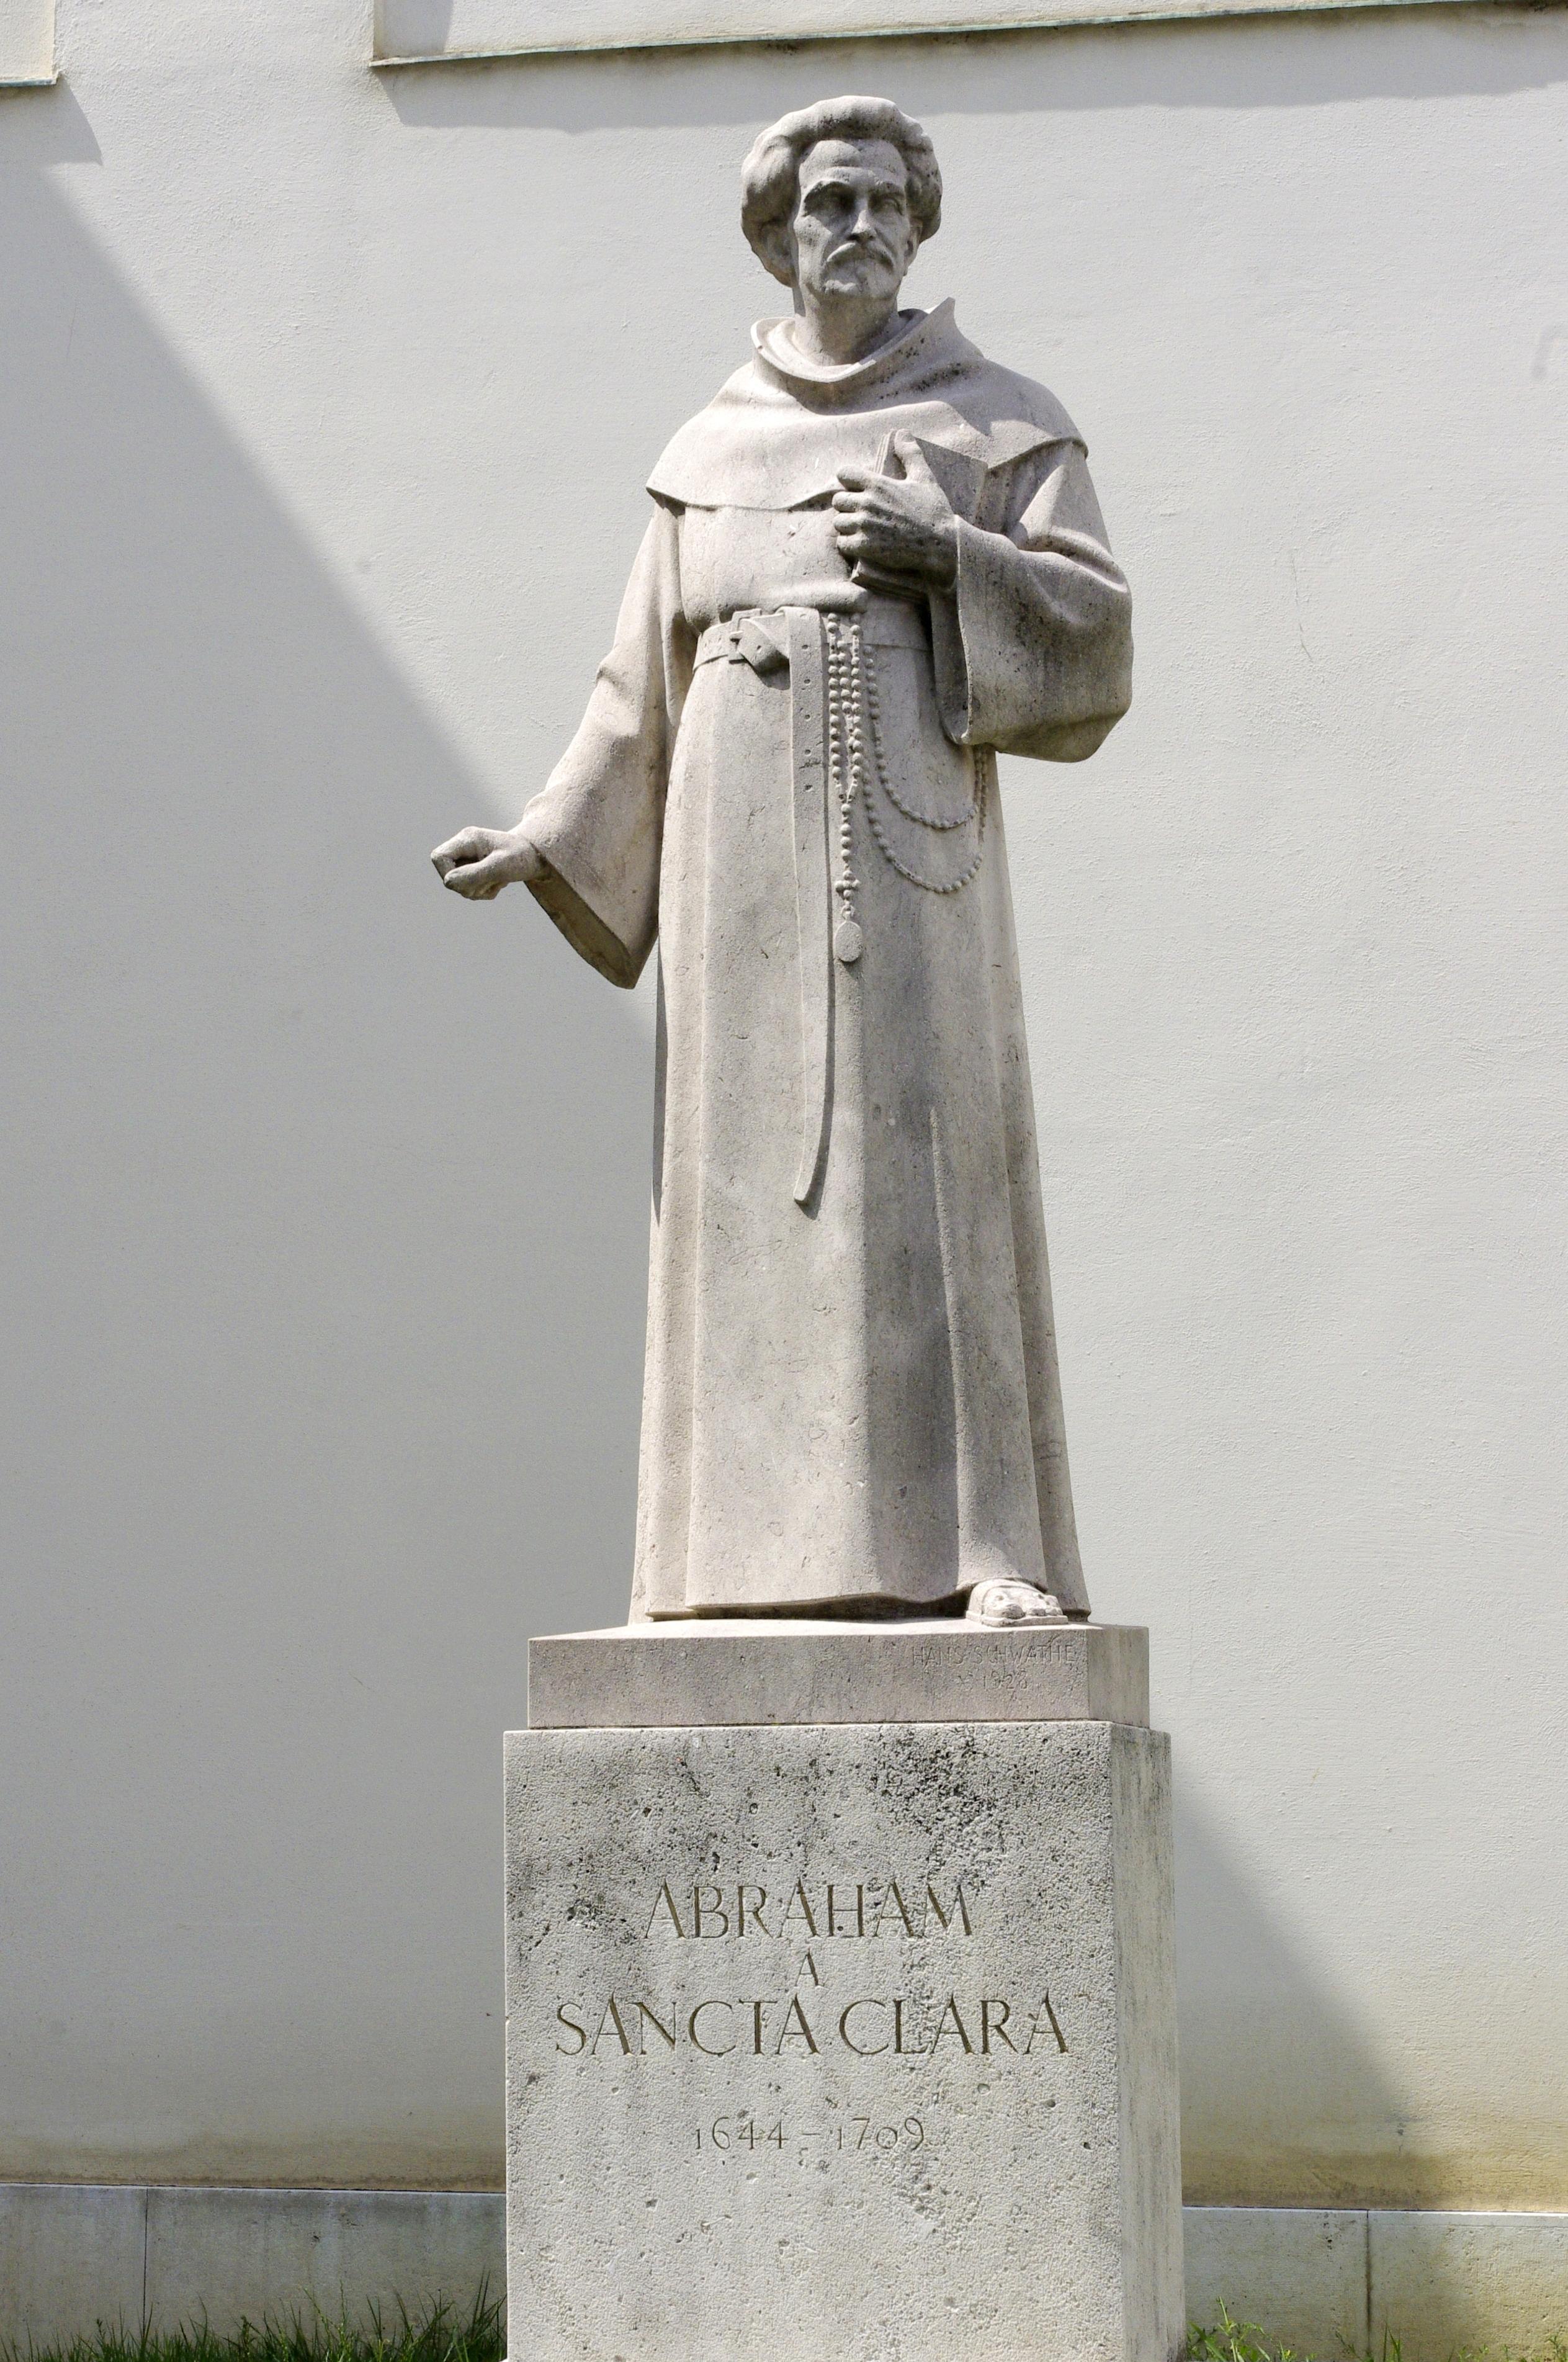 Sancta-Clara-Denkmal 01.JPG